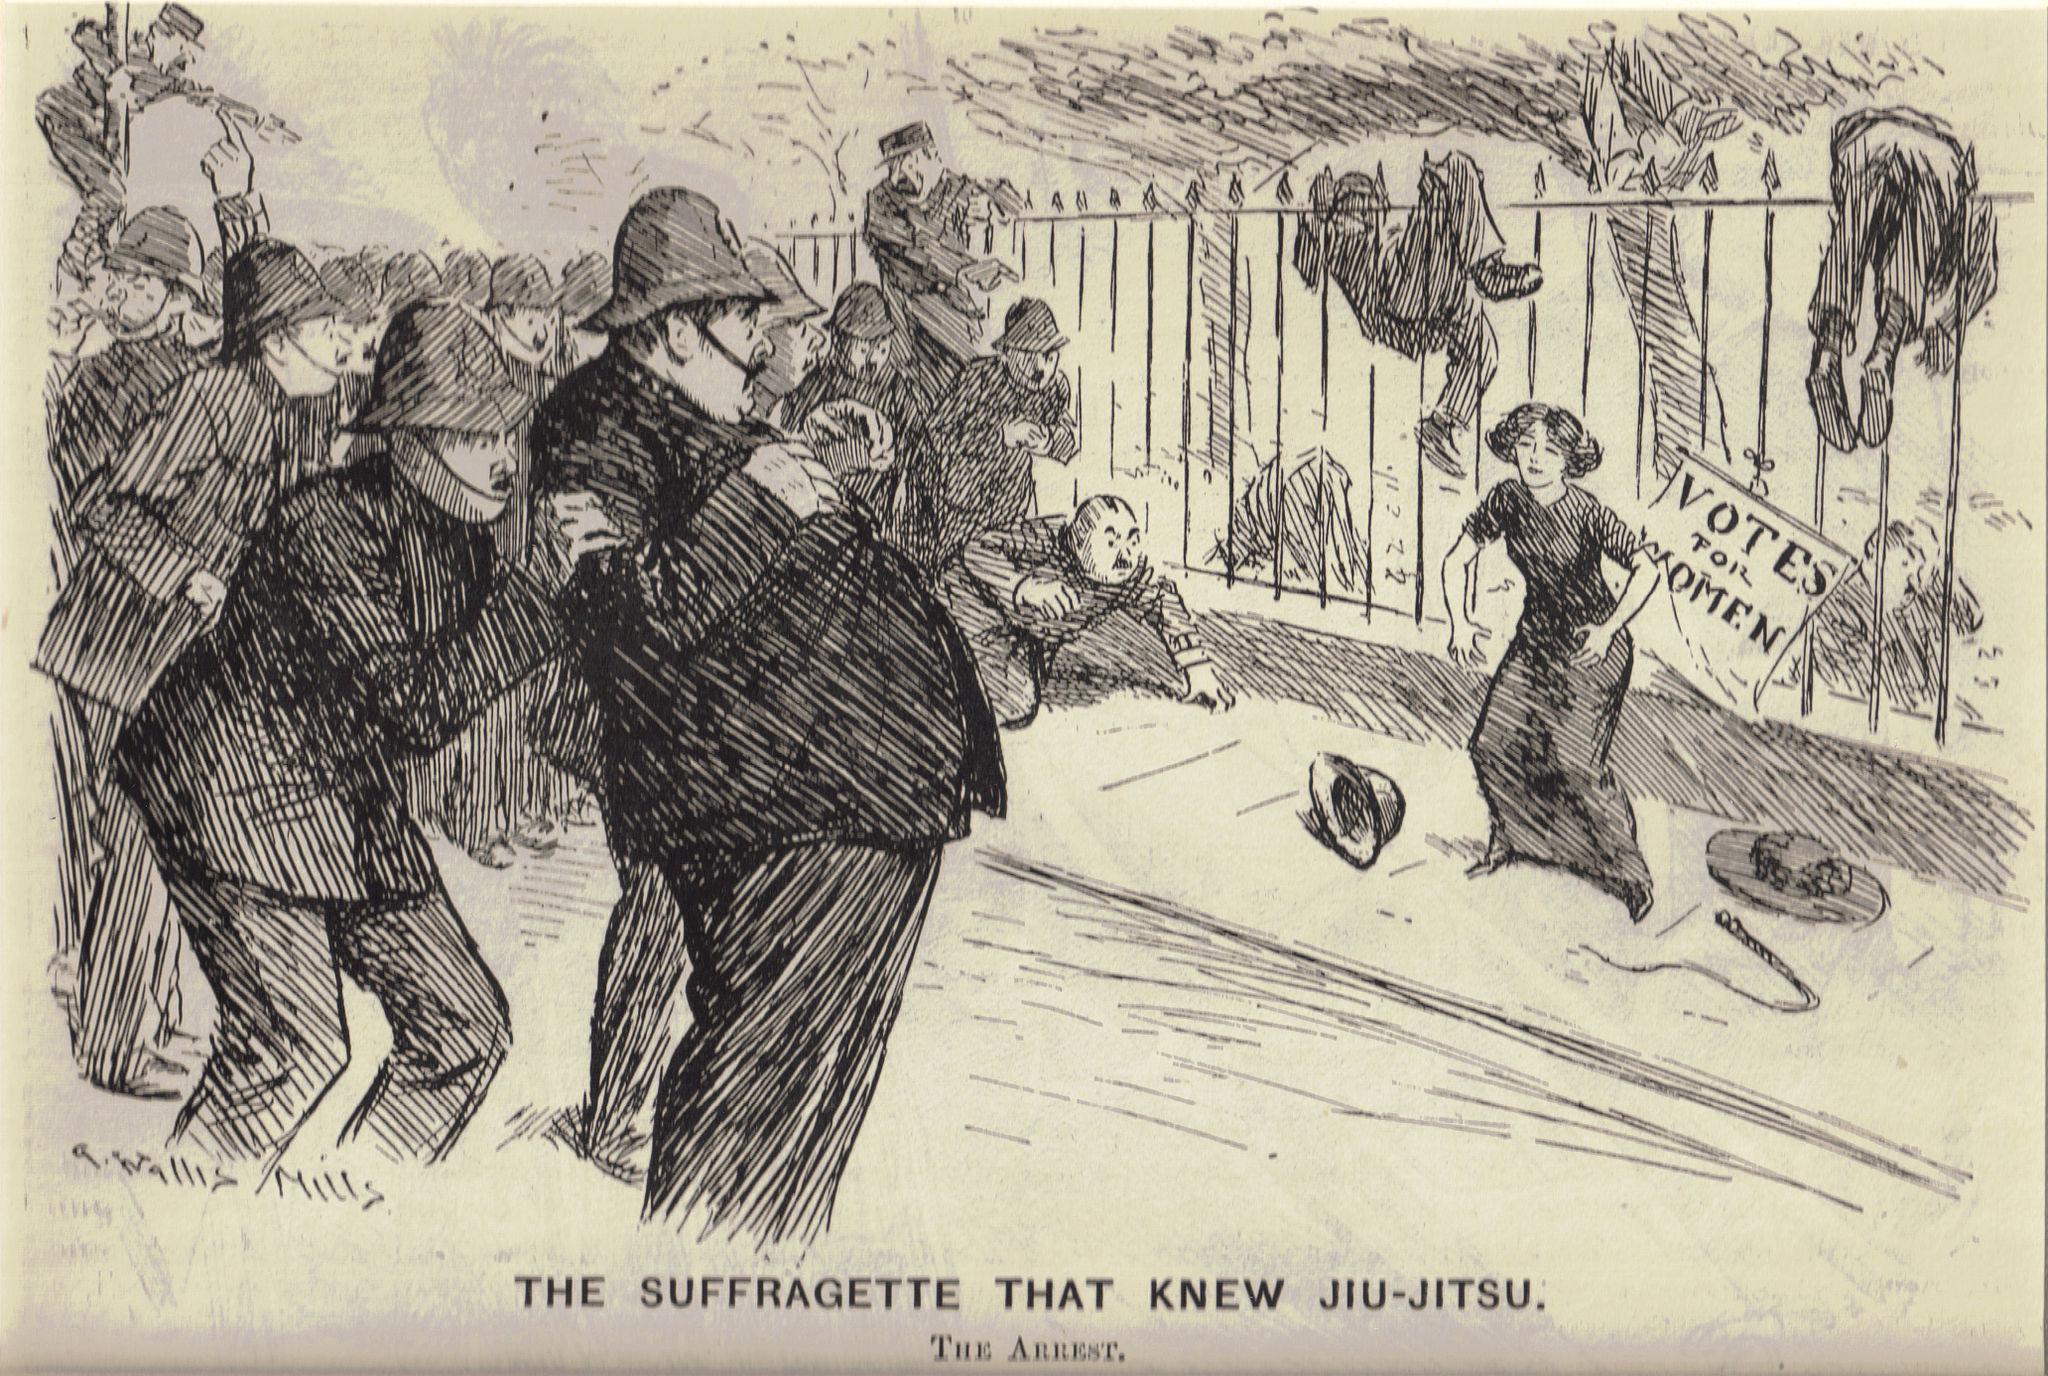 2048px-Suffragette-that-knew-jiujitsu